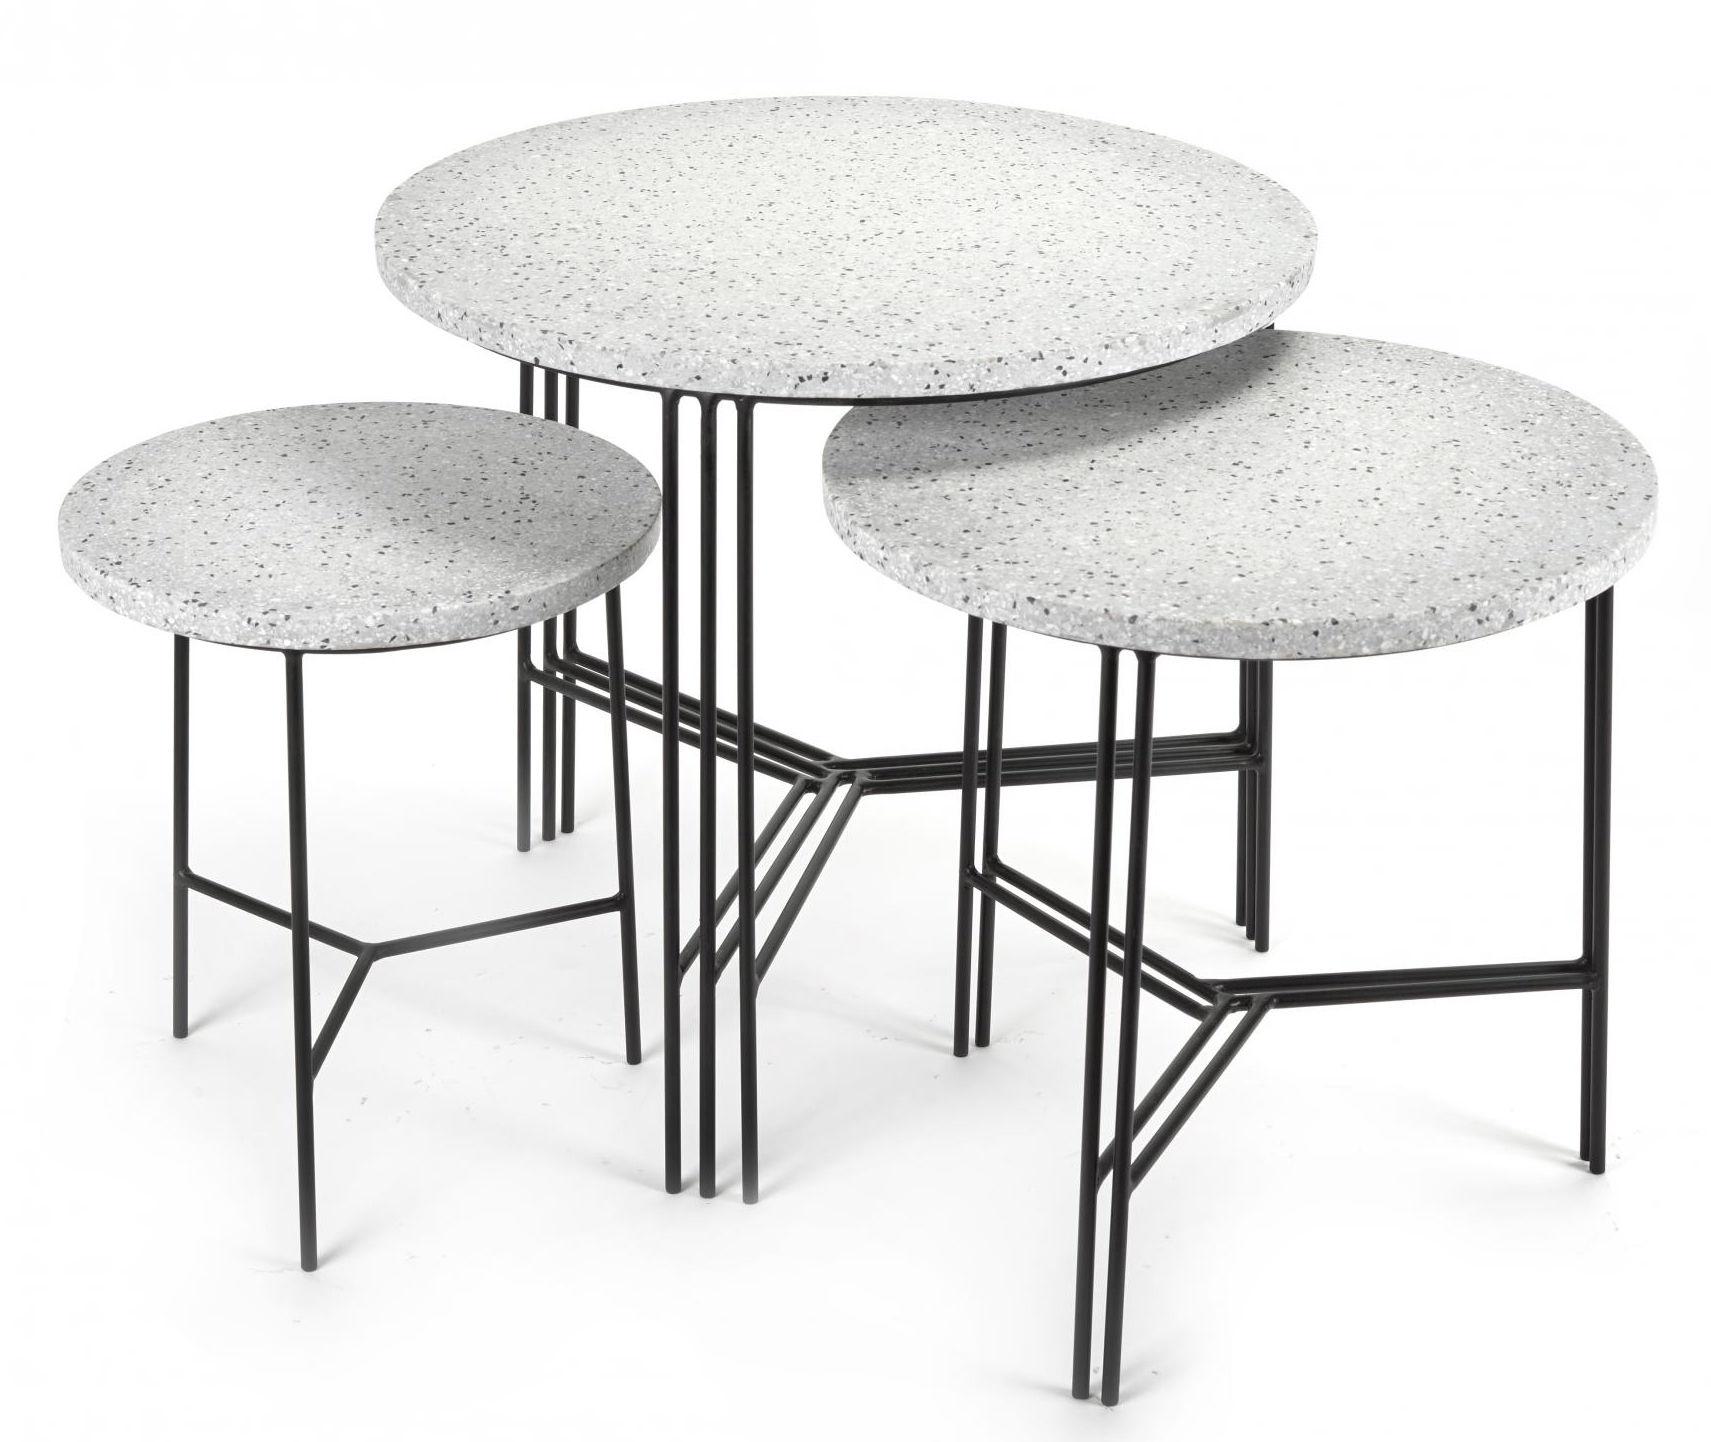 table basse terrazzo 50 x h 45 cm terrazzo gris pied noir serax made in design. Black Bedroom Furniture Sets. Home Design Ideas